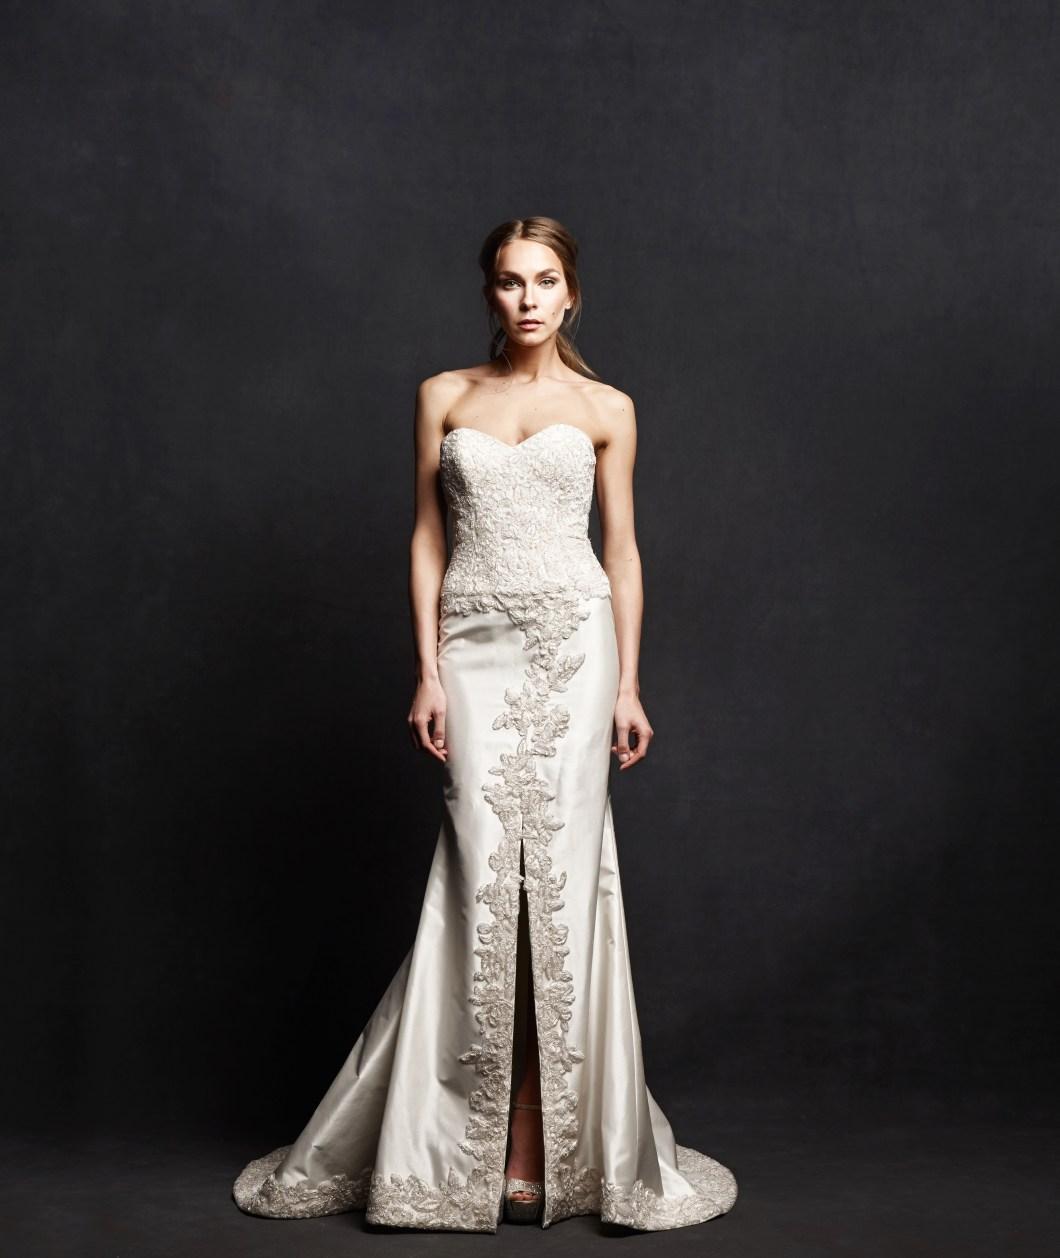 luxury wedding dress elegant isabelle armstrong